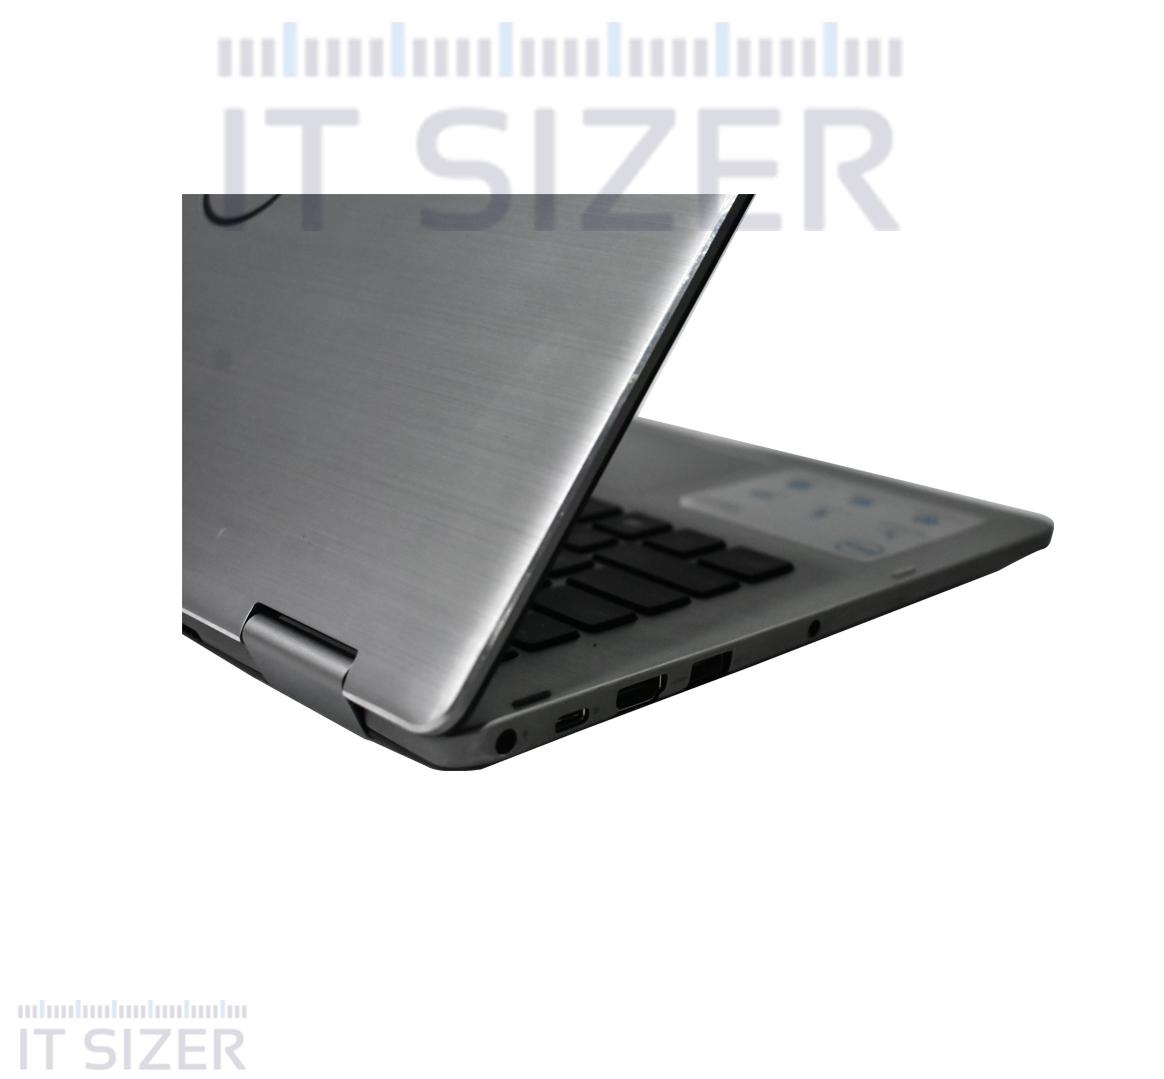 Dell Inspiron 7378 Business Laptop, Intel Core i7-7500U CPU, 16GB DDR4 SODIMM RAM, 512GB SSD M2, 13 inch Touch 360 Display, Windows 10 Pro (Renewed)